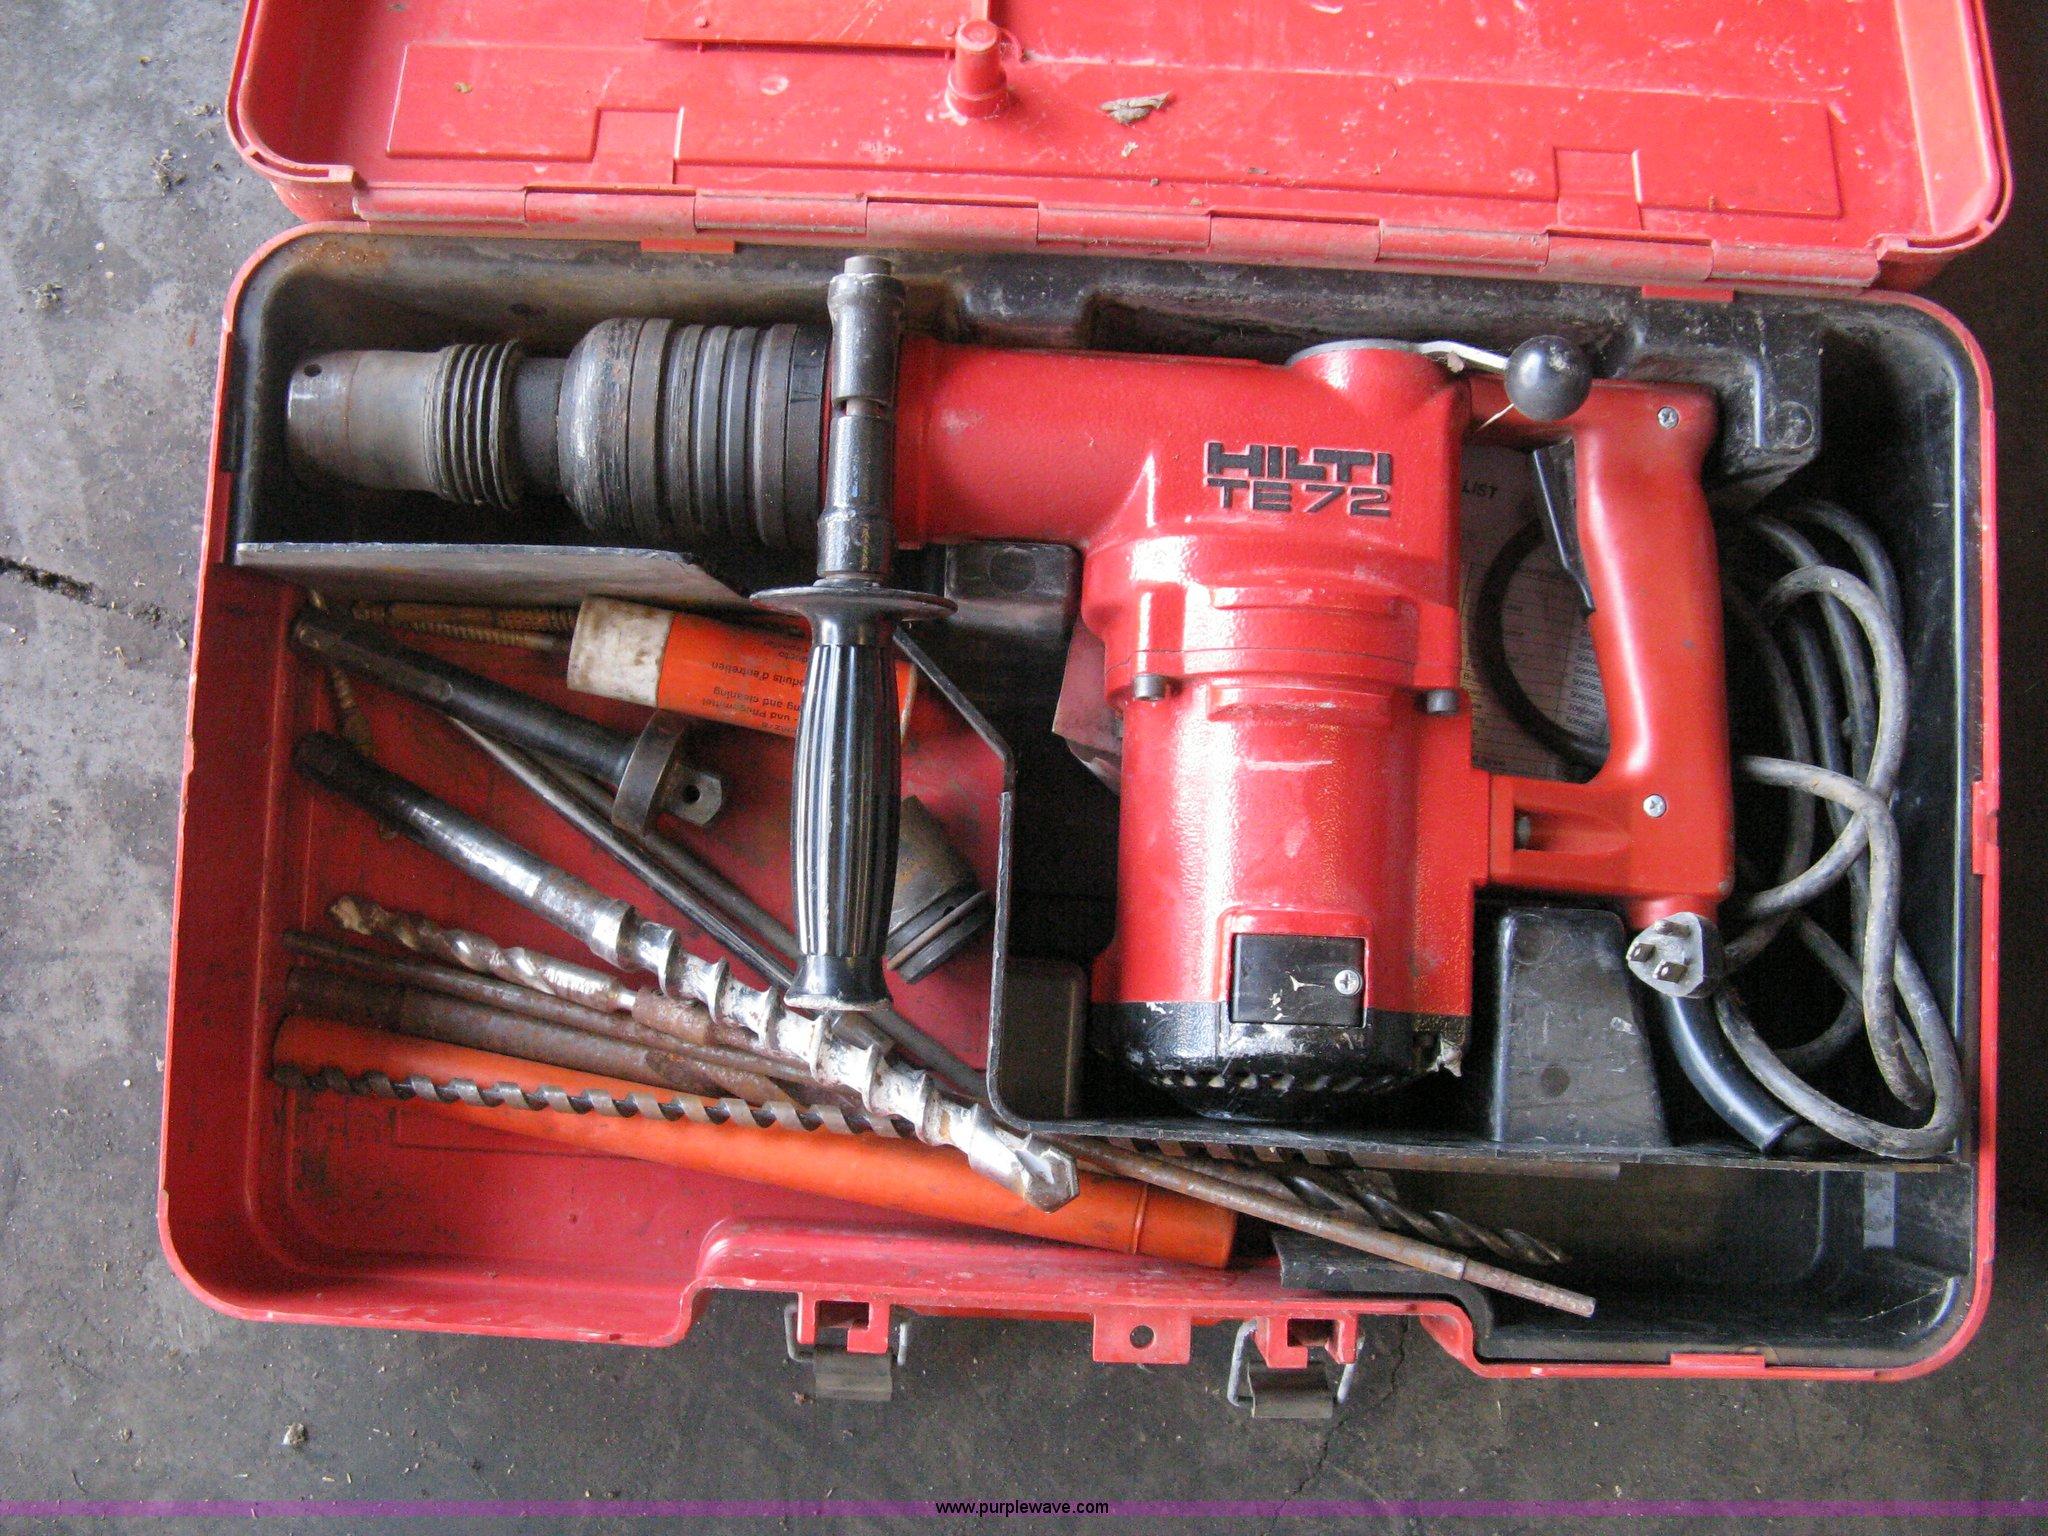 Hilti tools hammer drill te72 manual